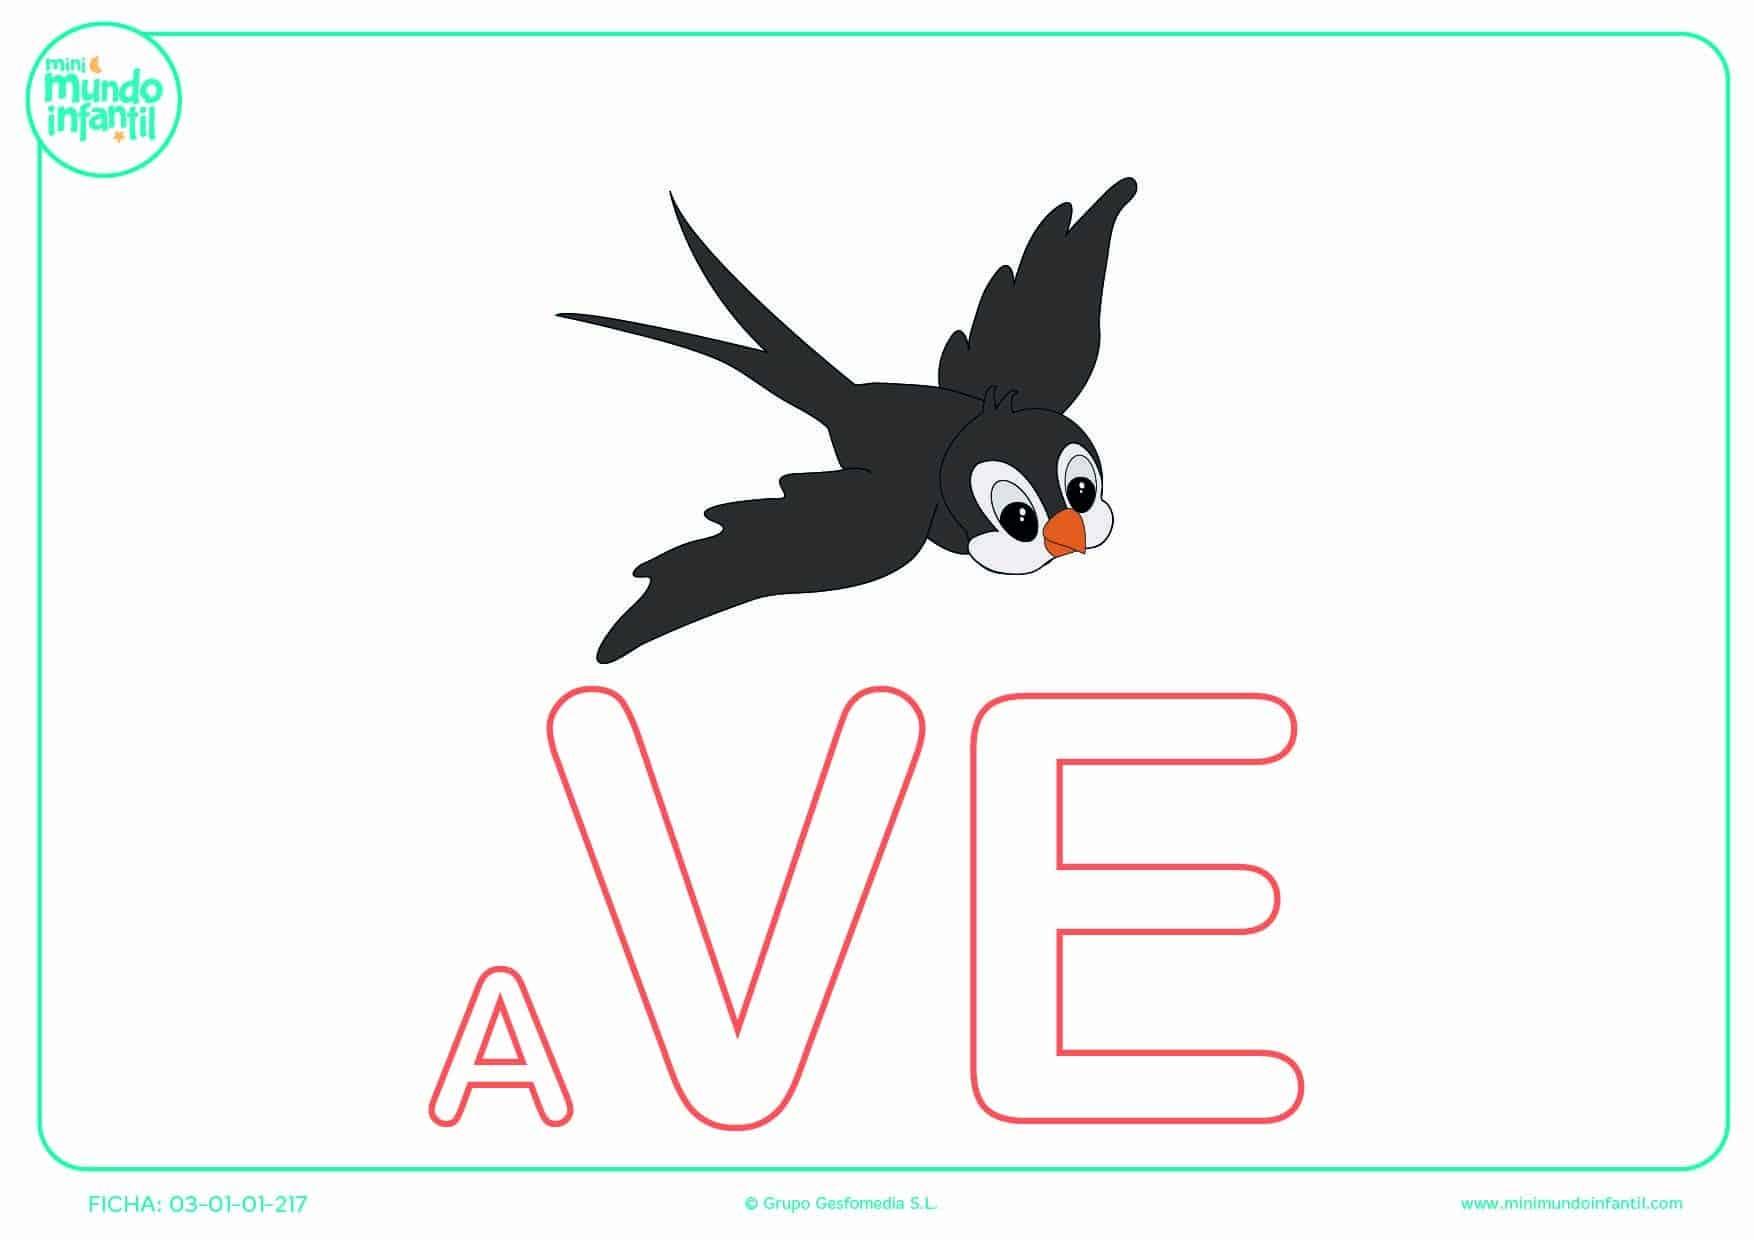 Rellenar la sílaba VE mayúscula de ave